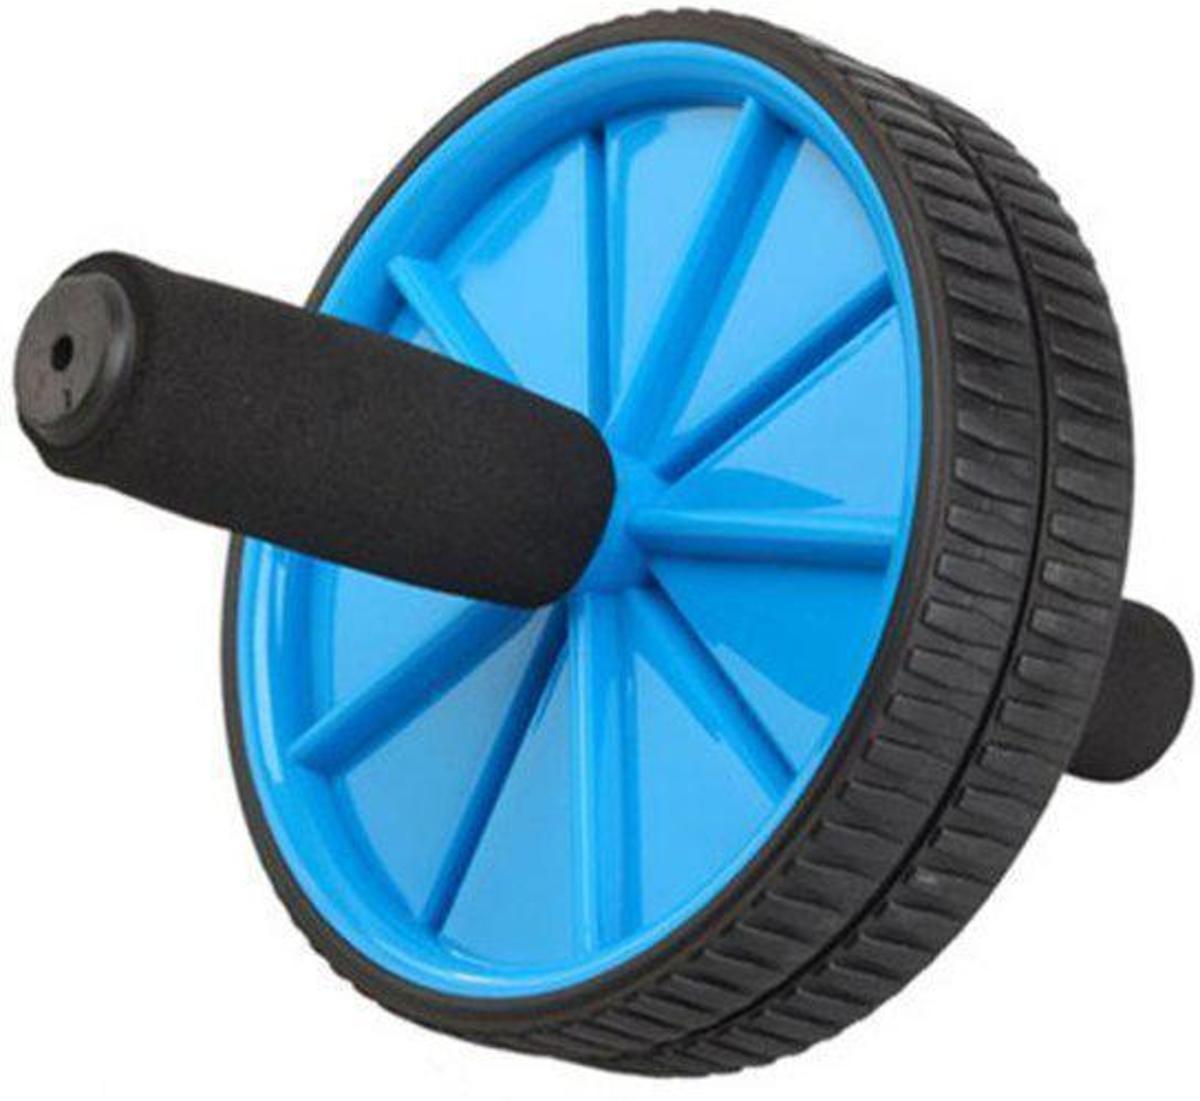 Trenas -  Double Ab Roller - Core Trainer - Core Wheel - Buikspiertrainer met dubbel wiel - Buikspier Wiel - Ø 18.5 cm - Blauw